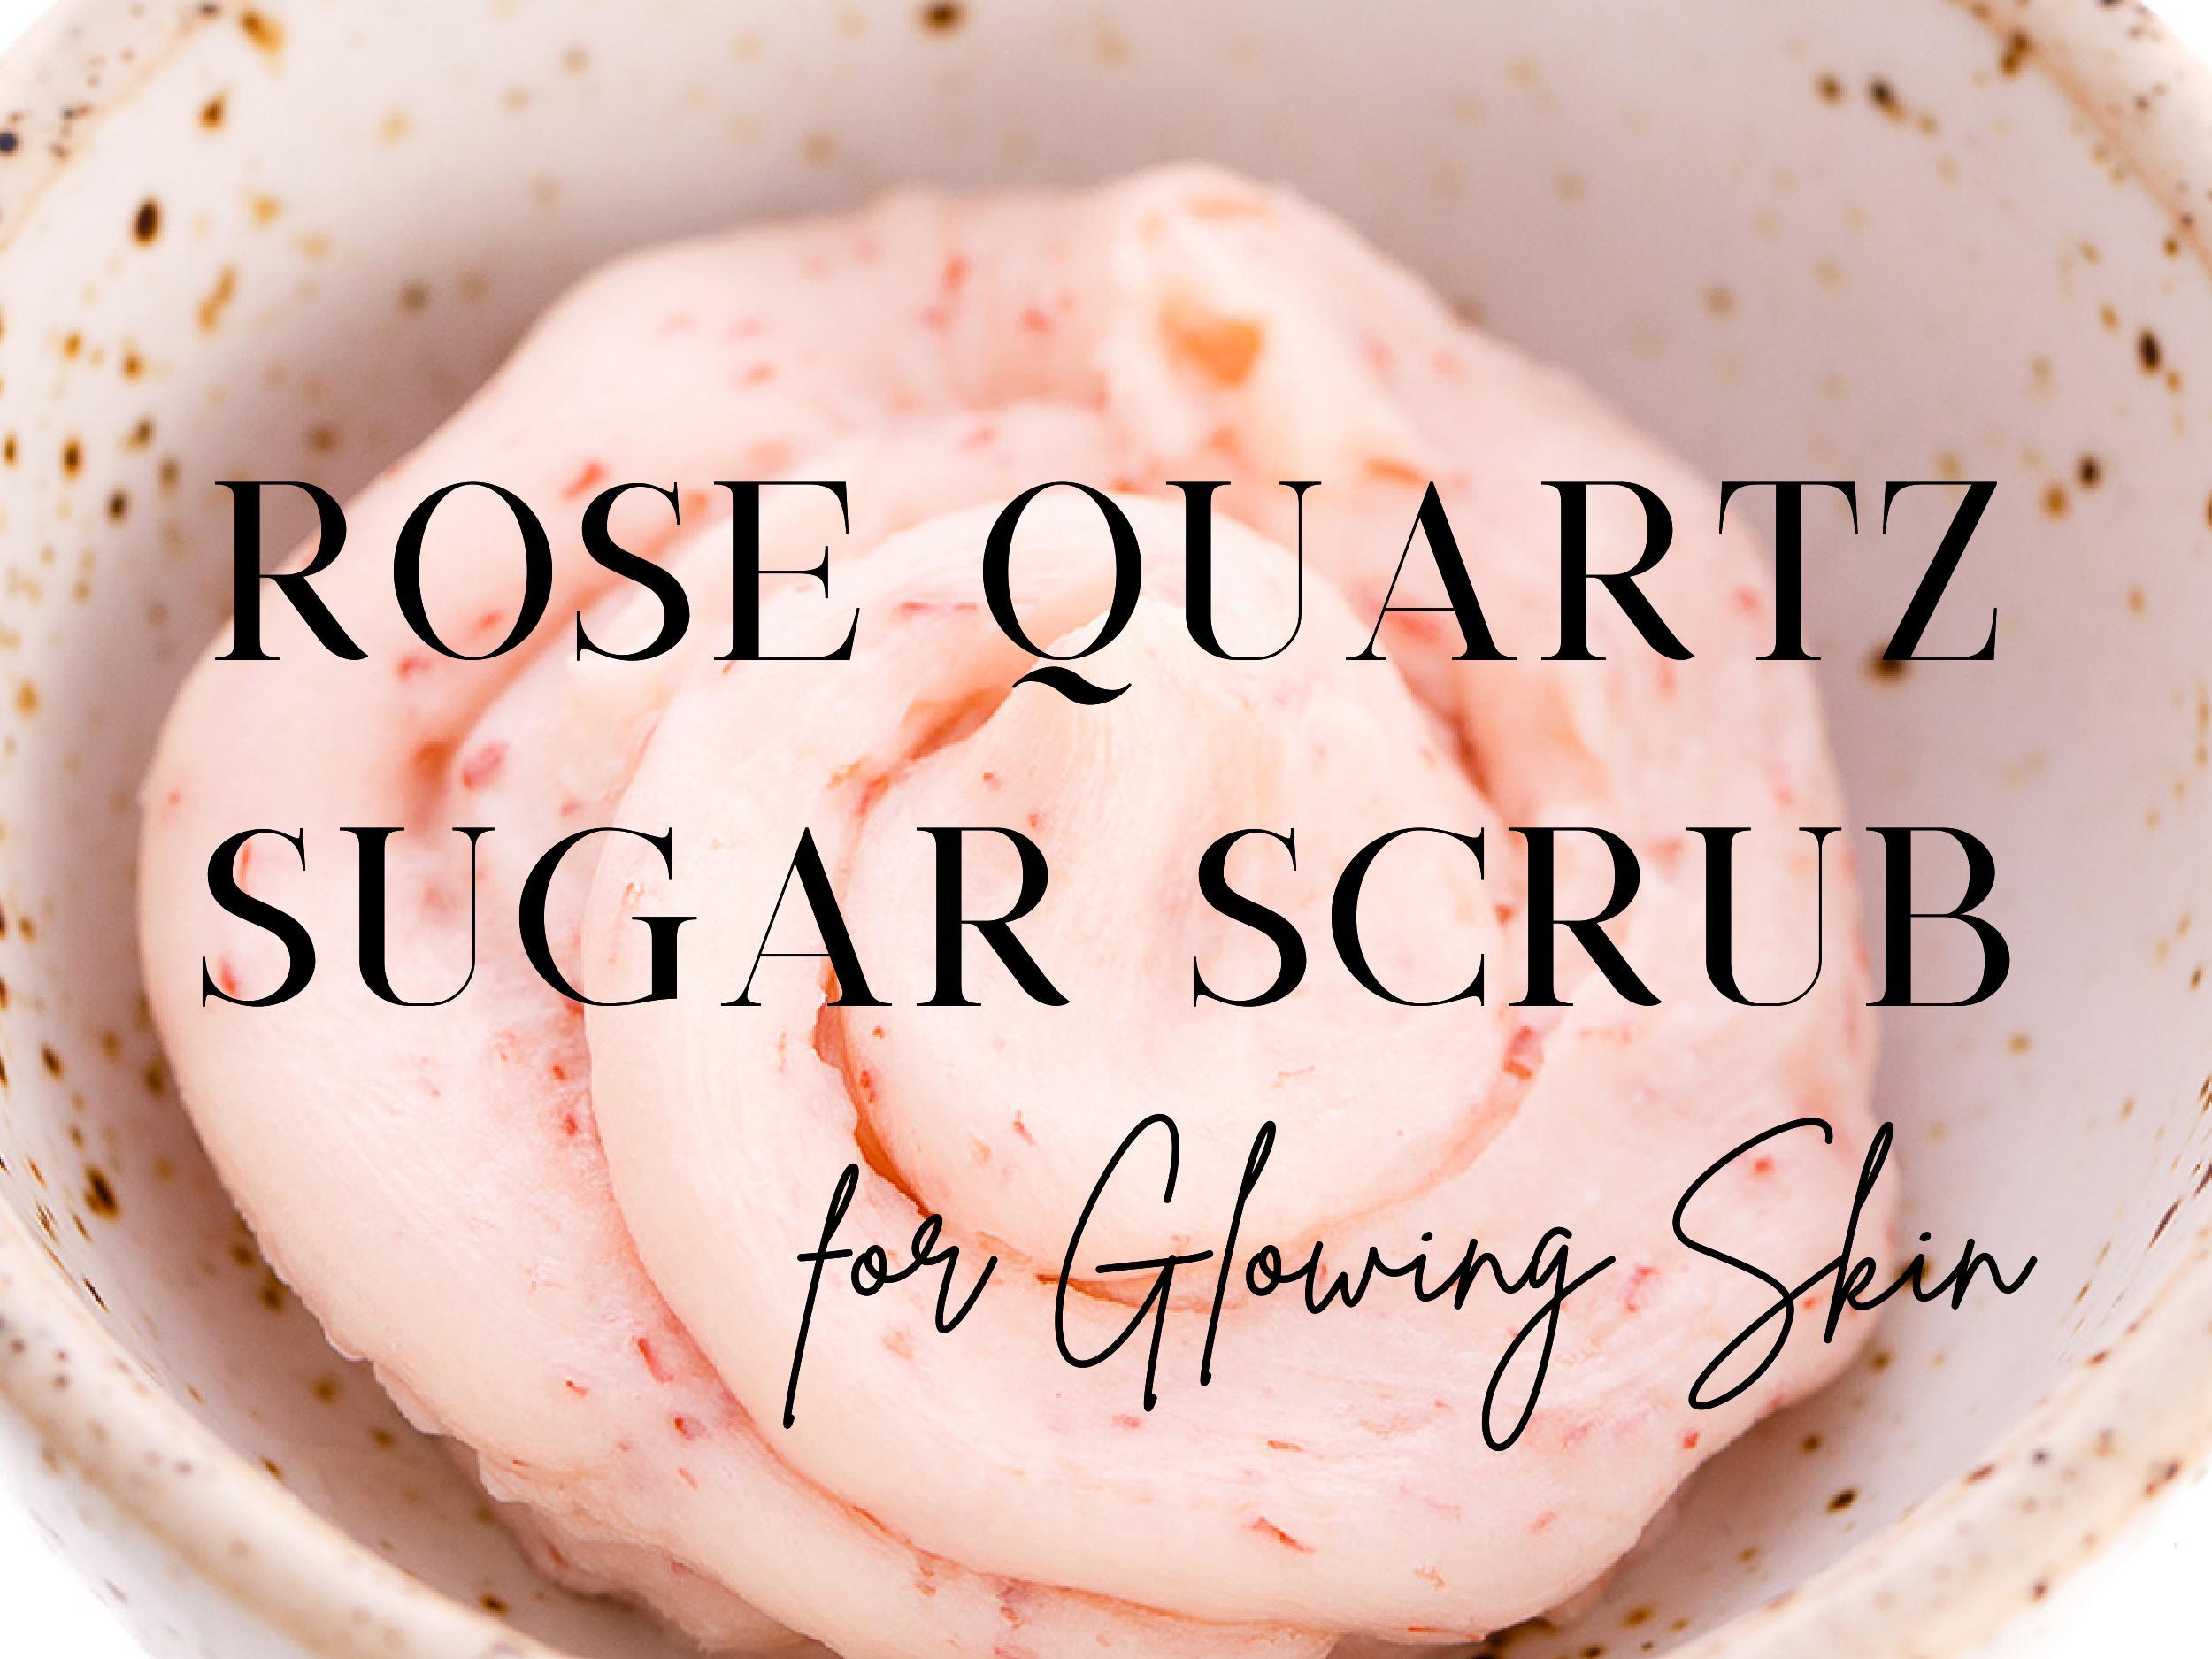 Rose Quartz Sugar Scrub